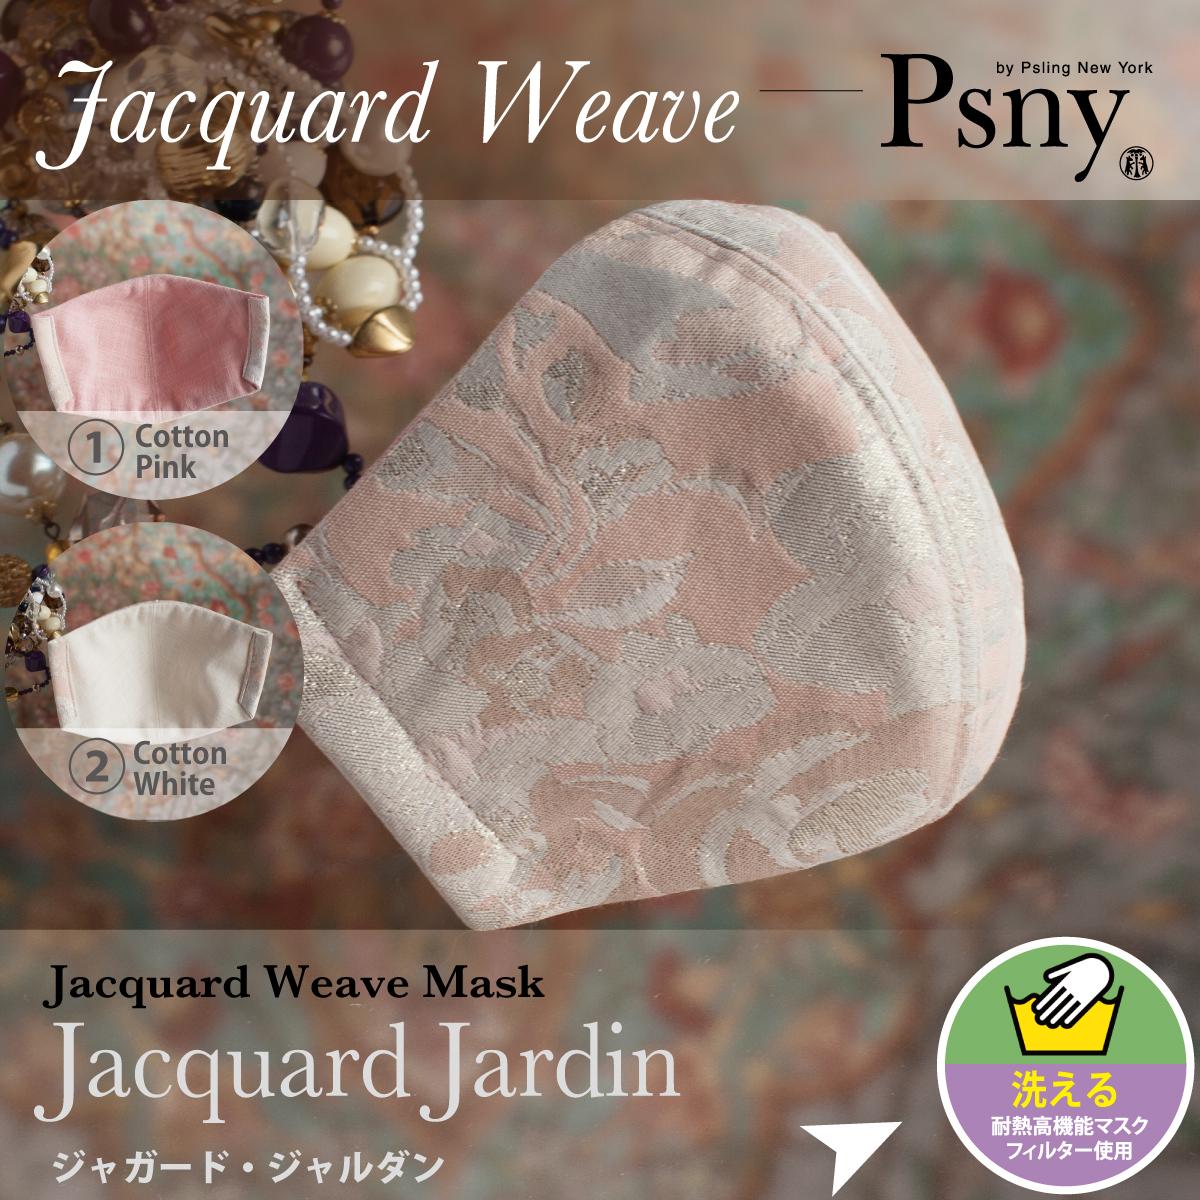 PSNY ジャガード・箔ジャルダン 花粉 黄砂 洗える不織布フィルター入り 立体 大人 ジャカード おとな 高級 マスク 送料無料 FJ3